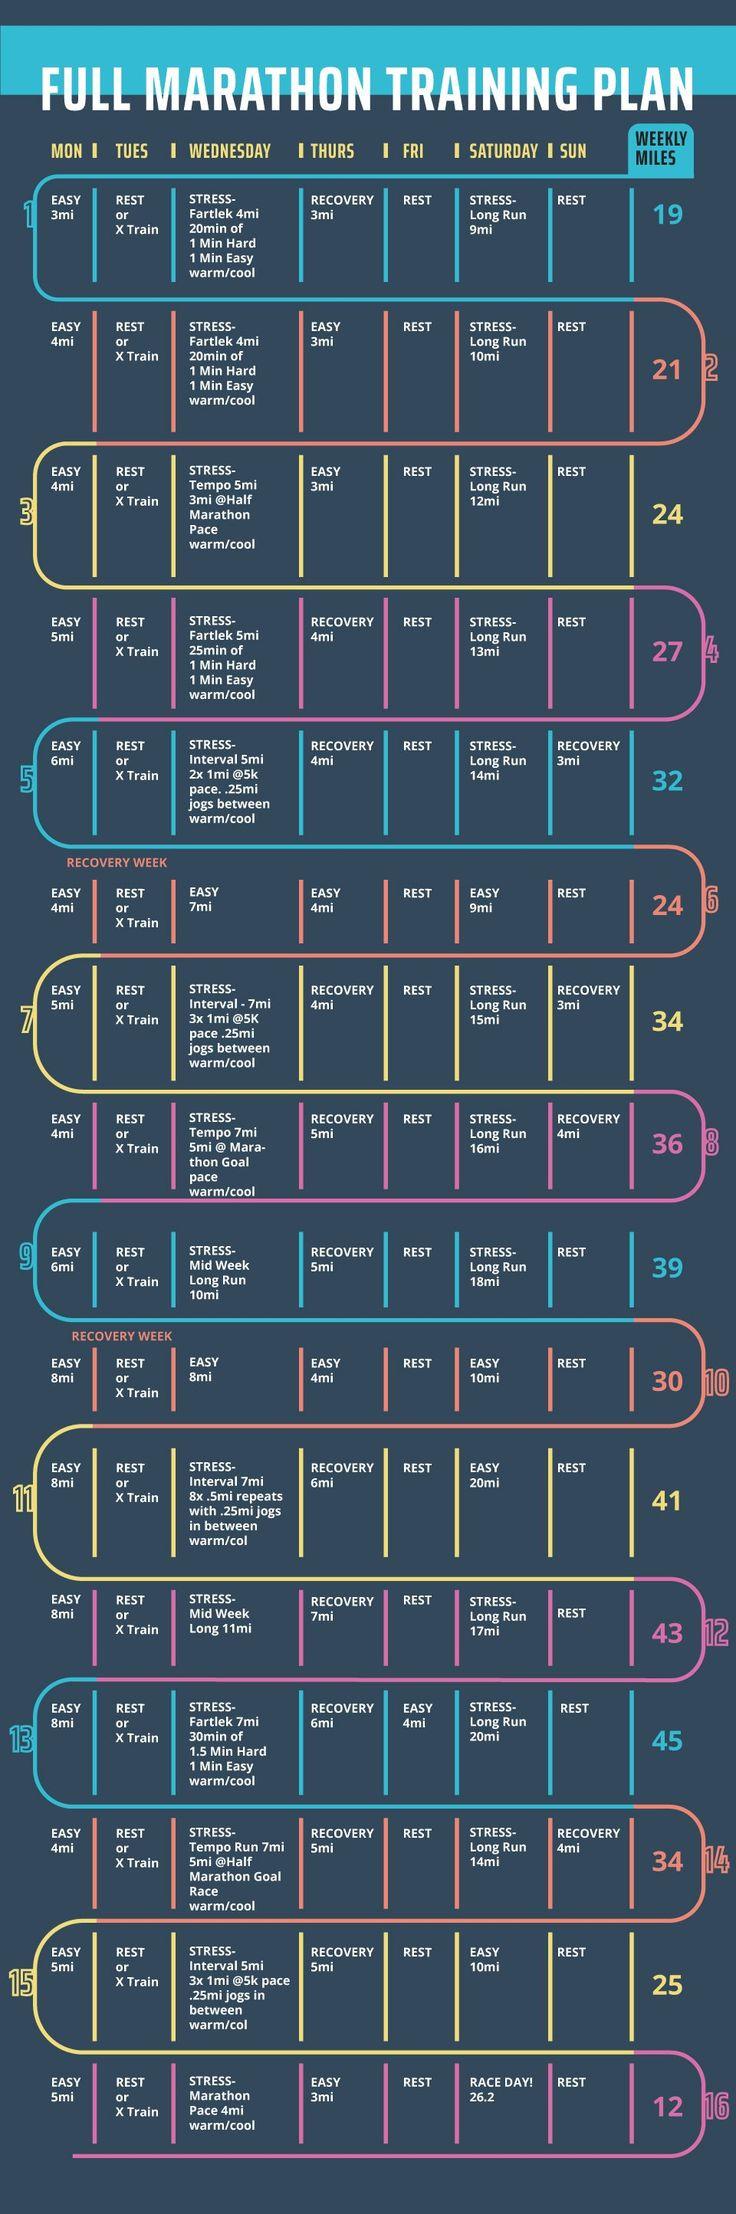 Full Marathon Training Plan | Zappos.com